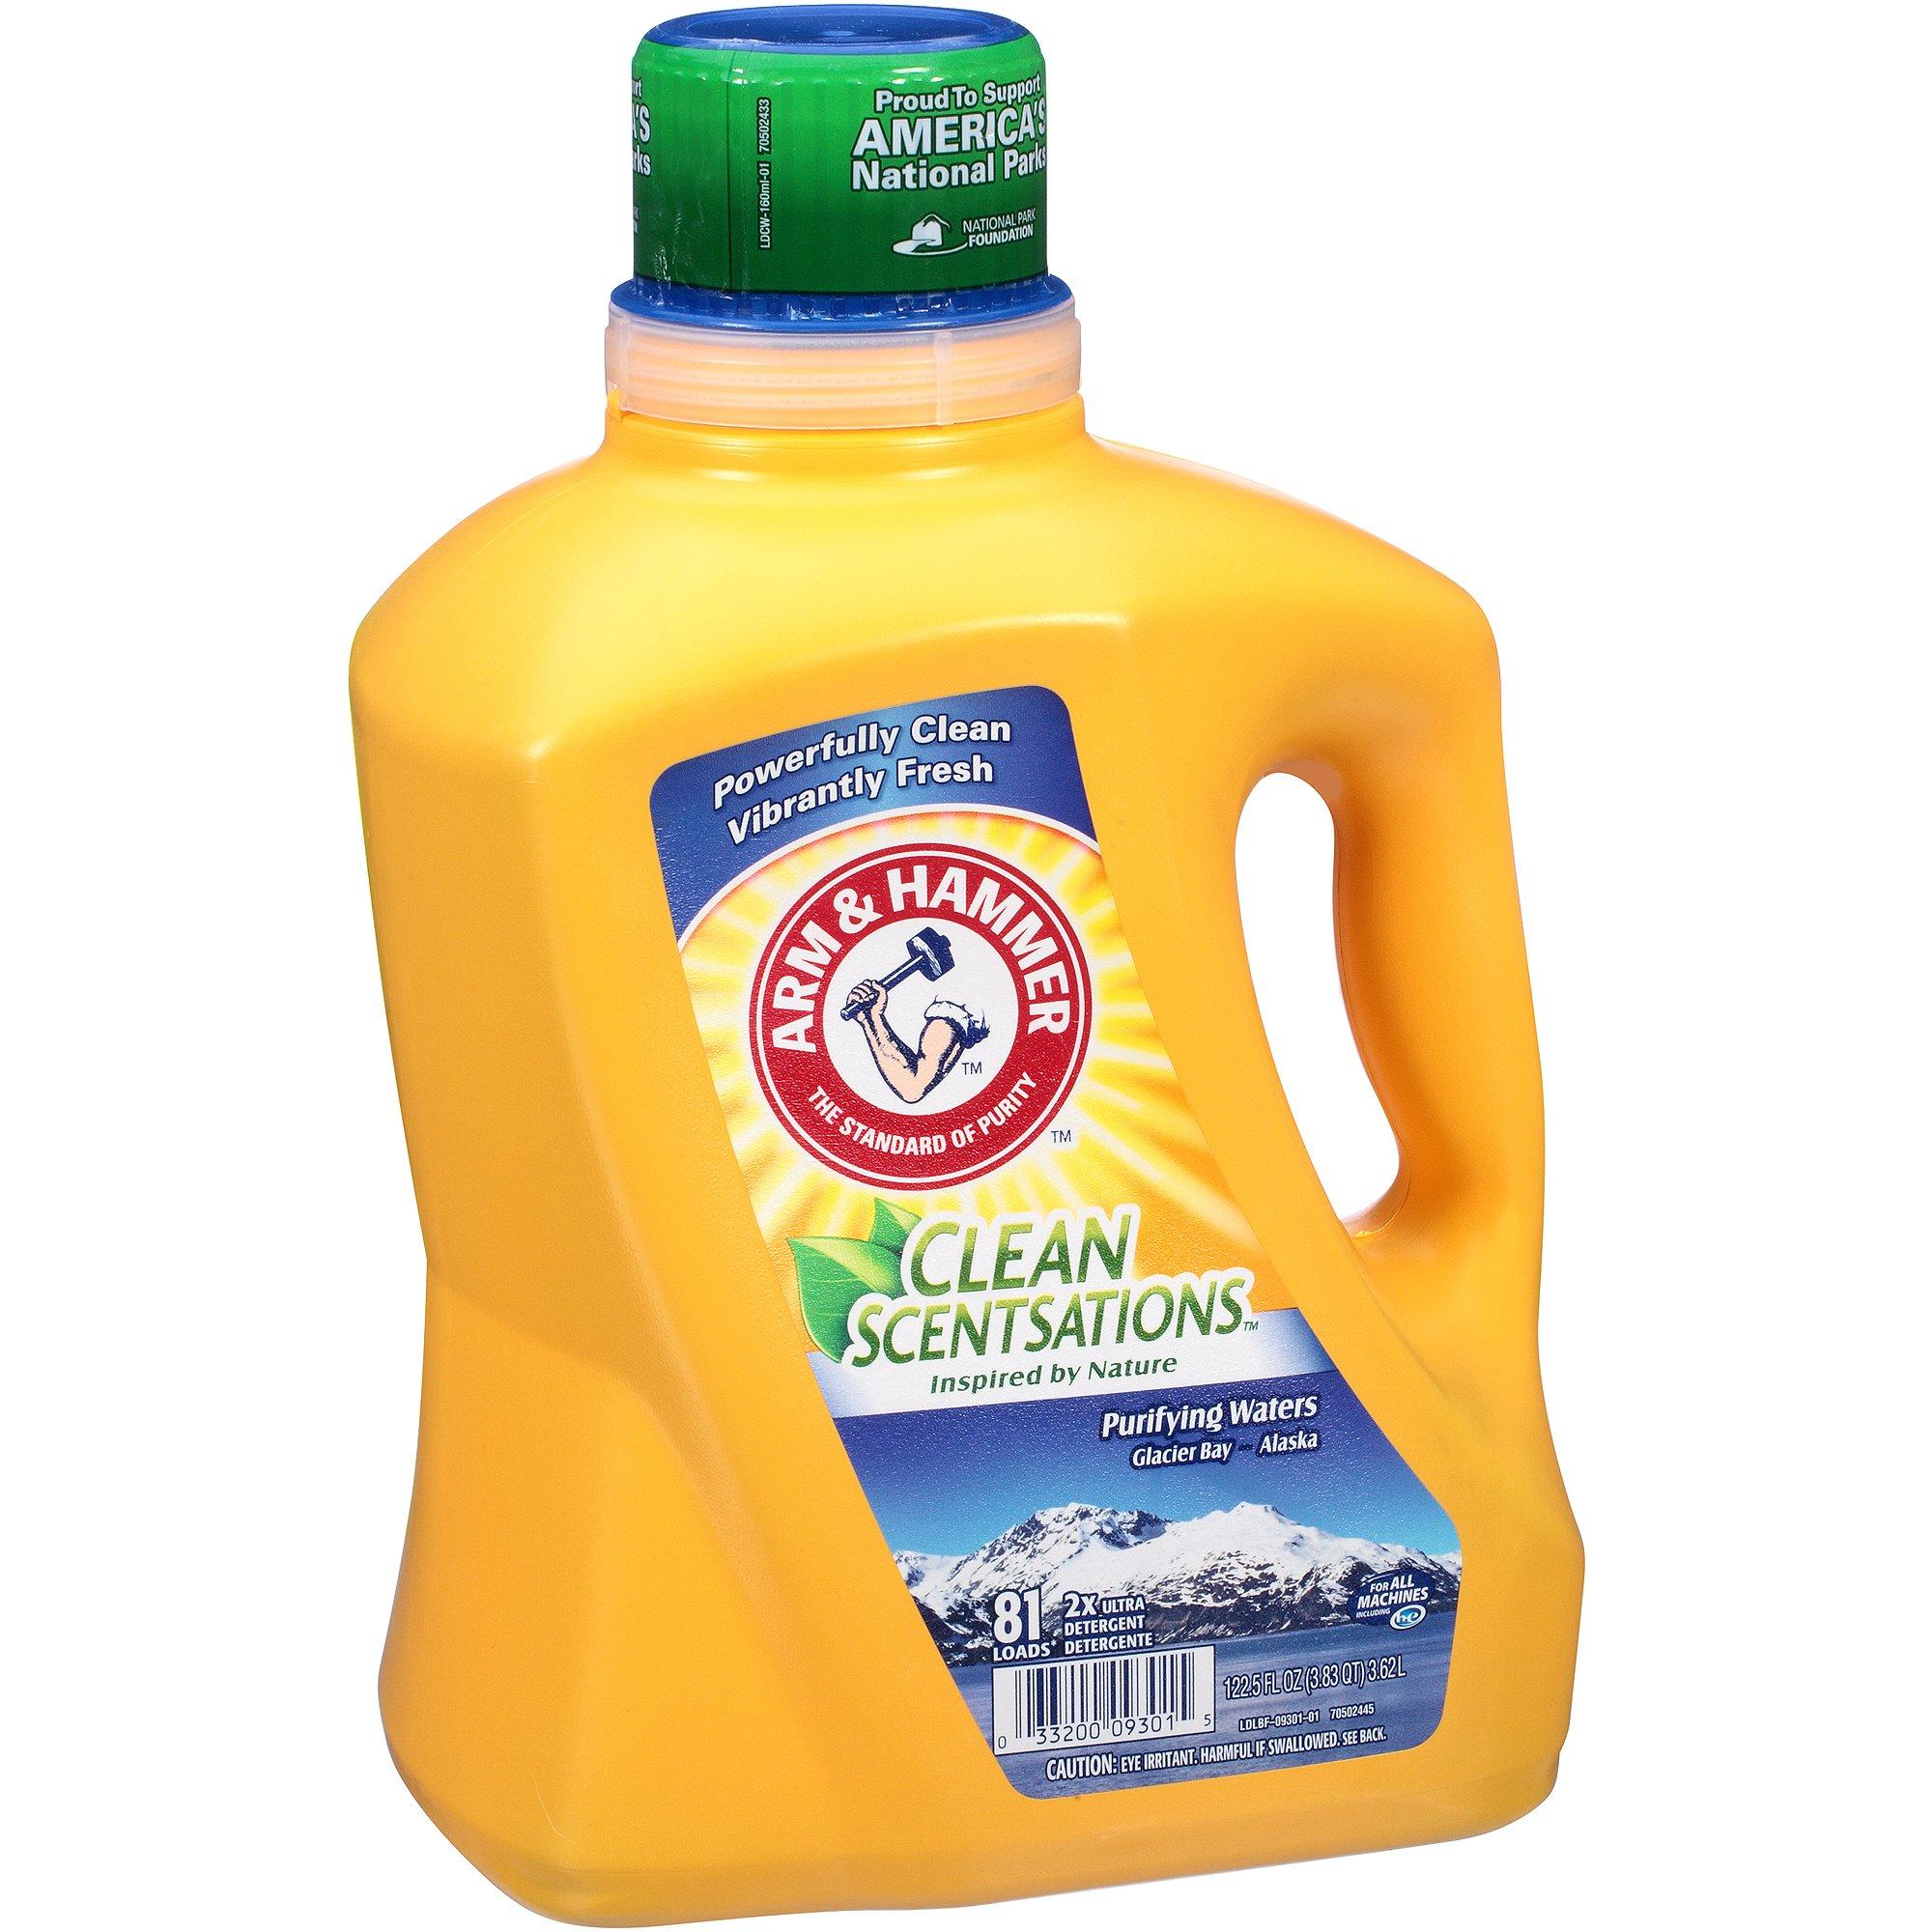 Arm & Hammer Clean Scentsations Purifying Waters Liquid Laundry Detergent, 81 loads, 122.5 fl oz